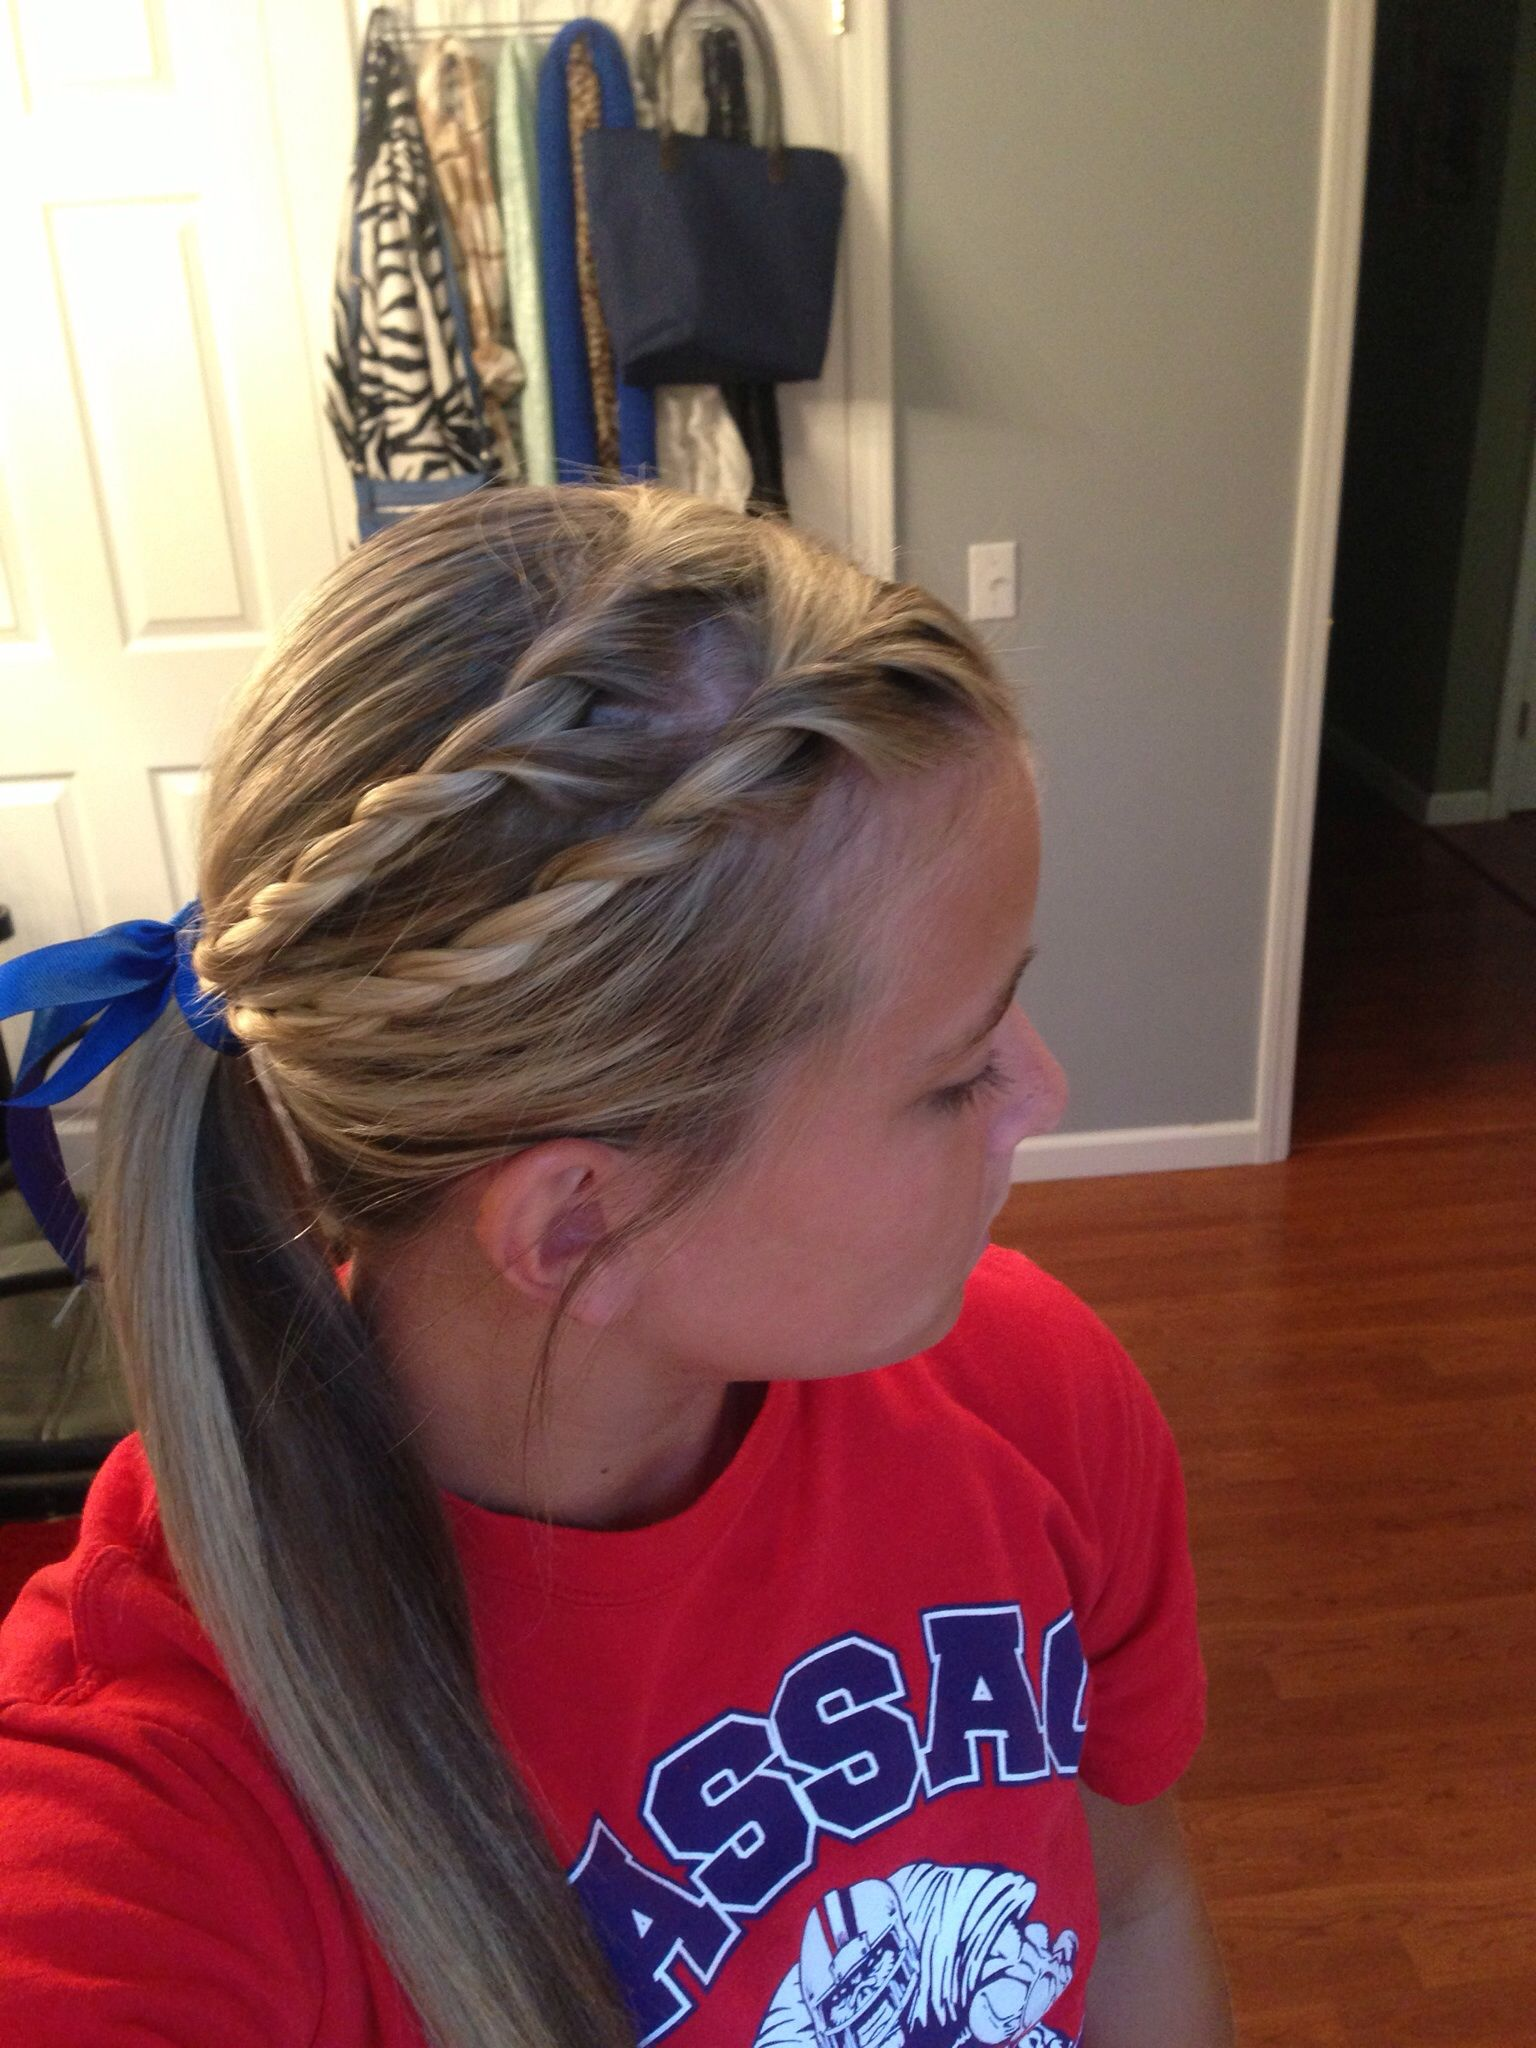 Softball hair gymnastics hair pinterest softball hairstyles